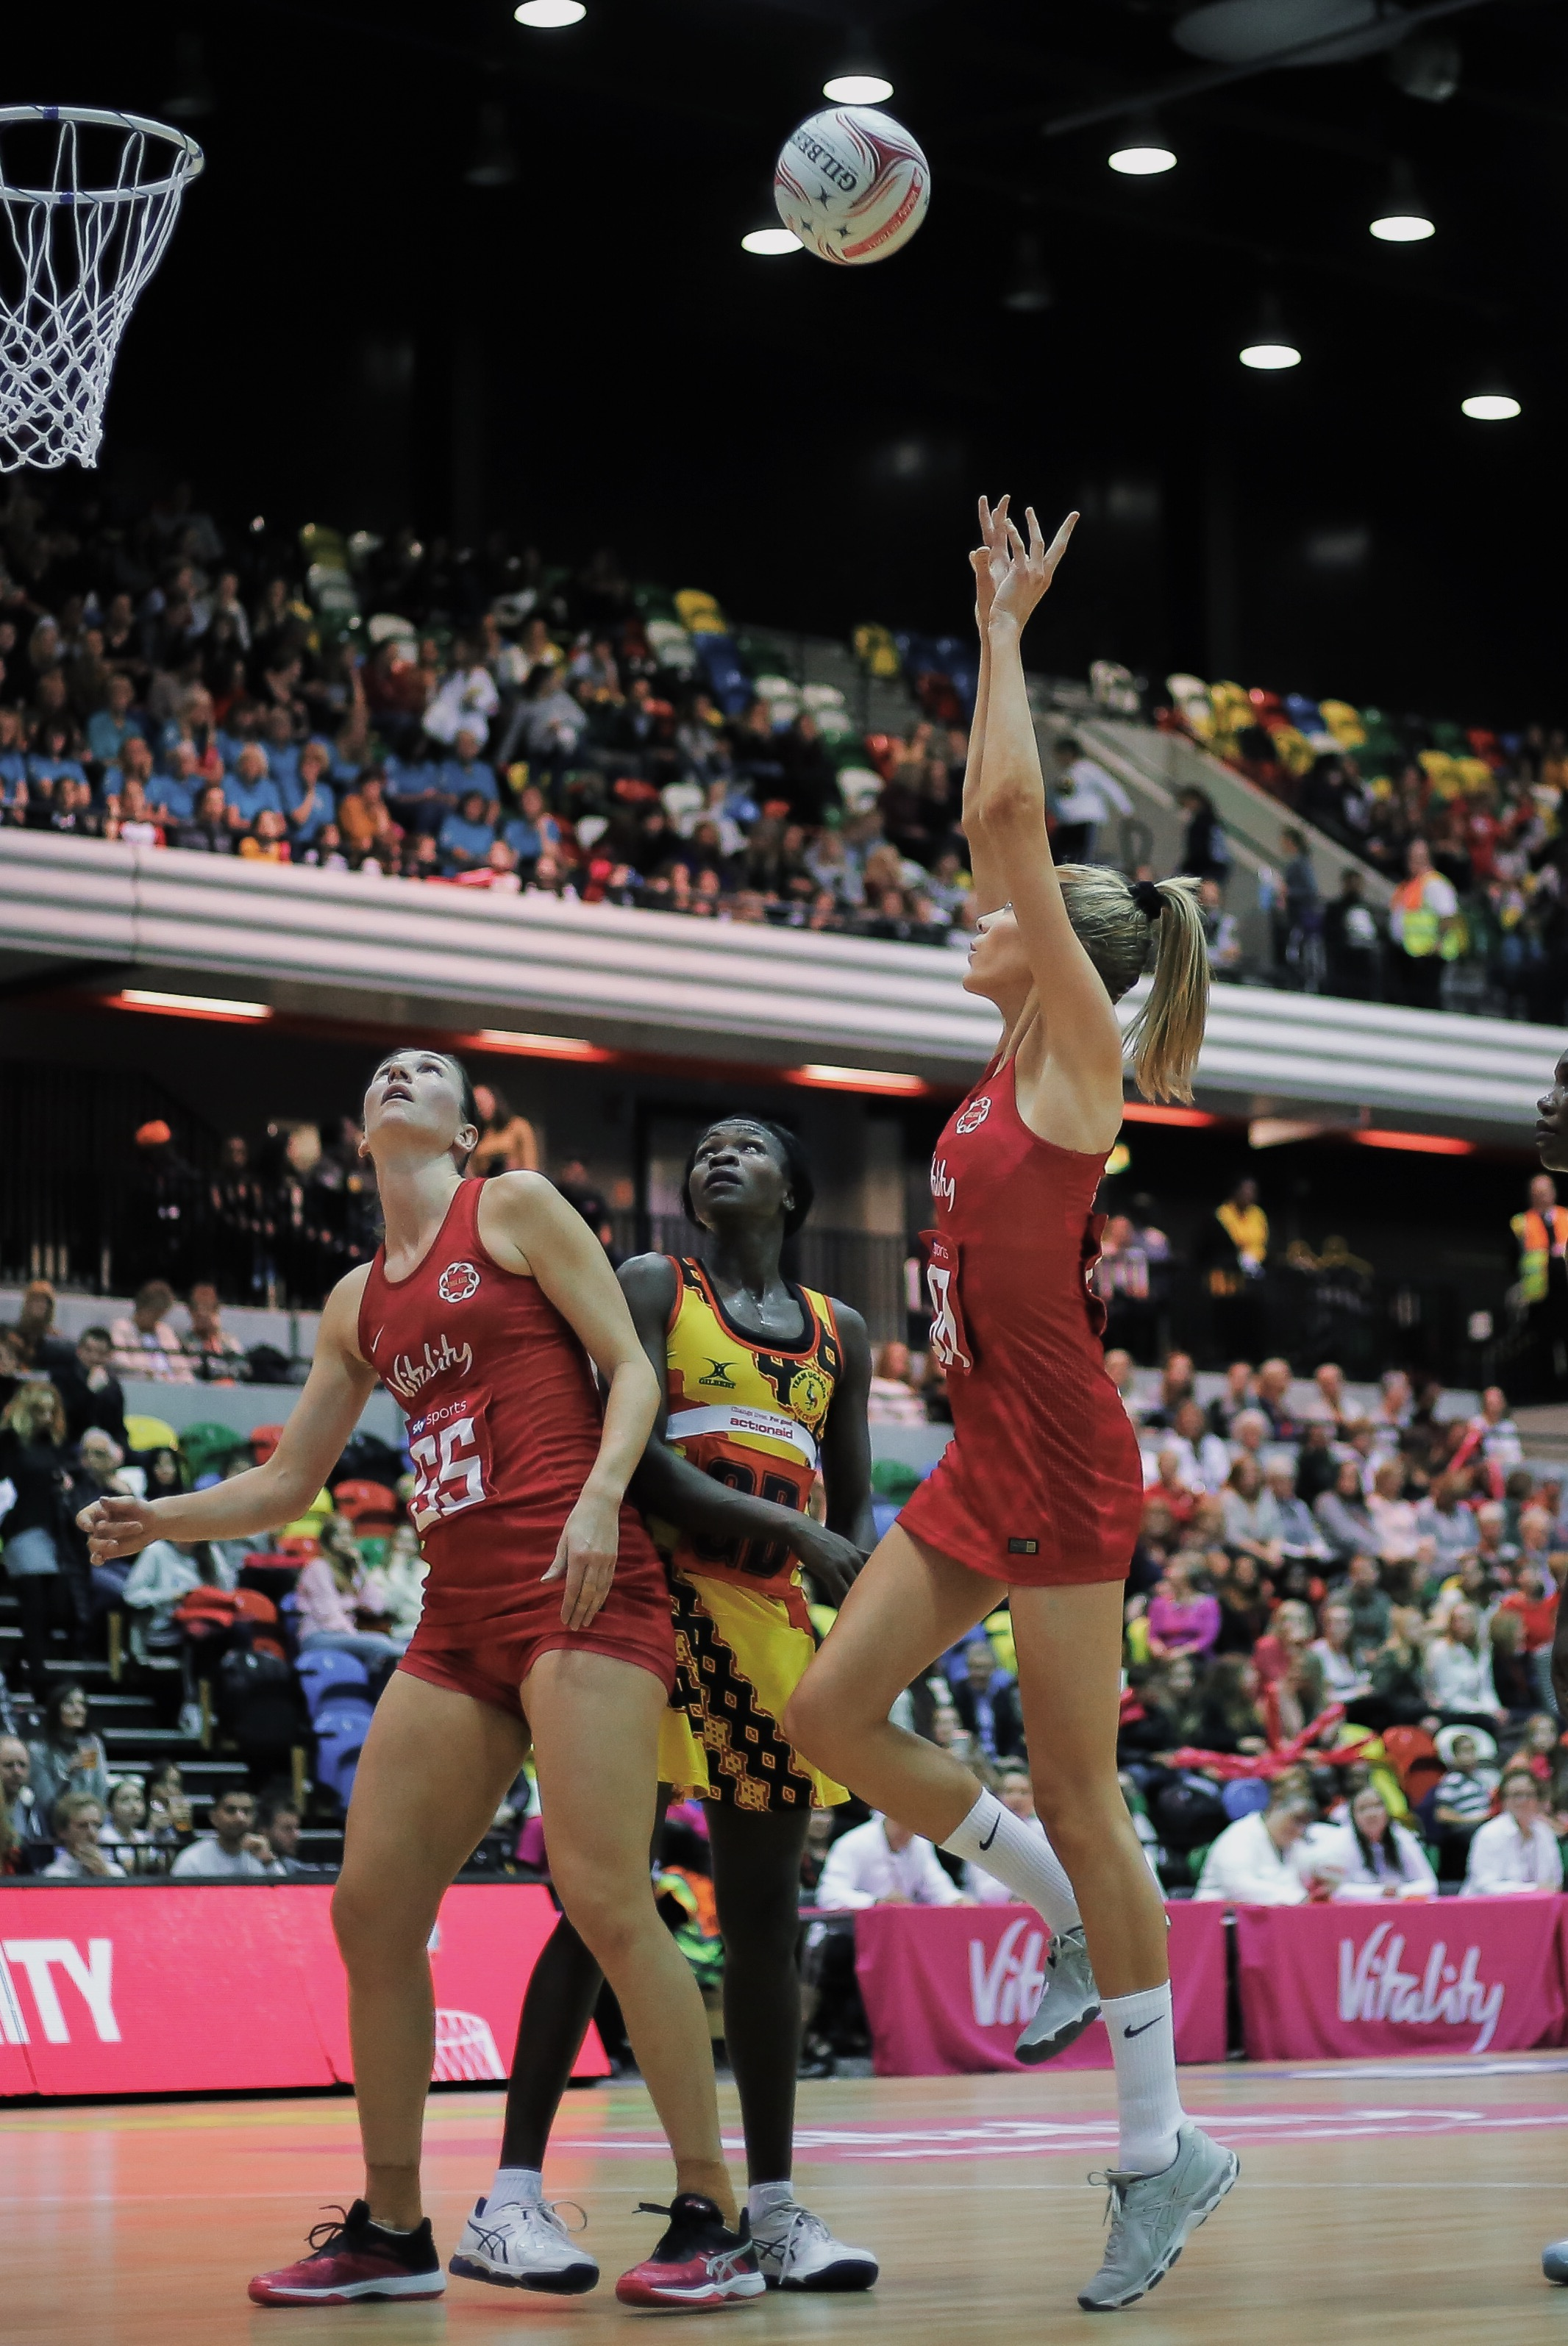 womens-netball-sport-england-uganda-international-series-10.jpg